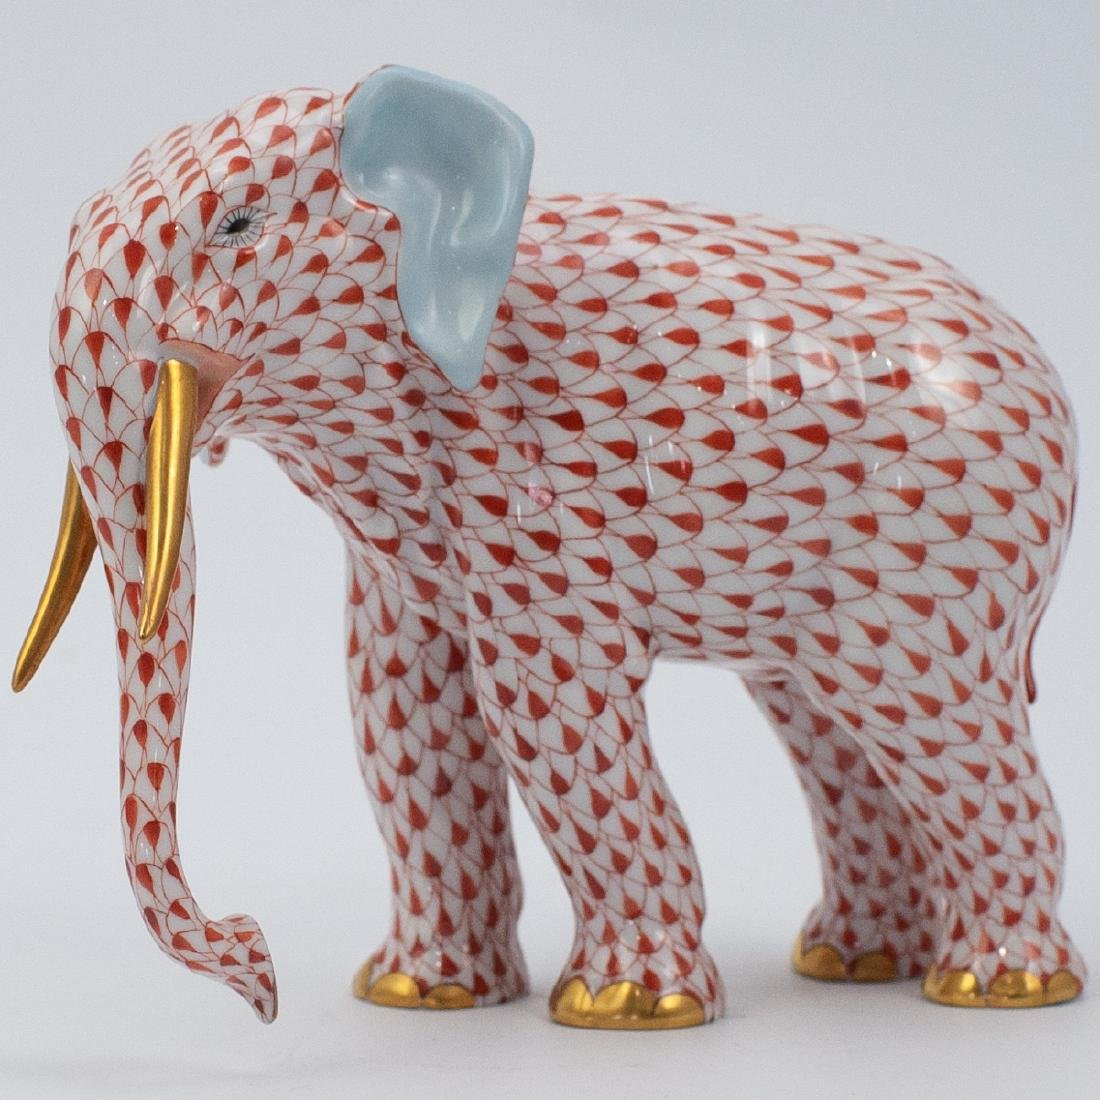 Herend Porcelain Fishnet Elephant